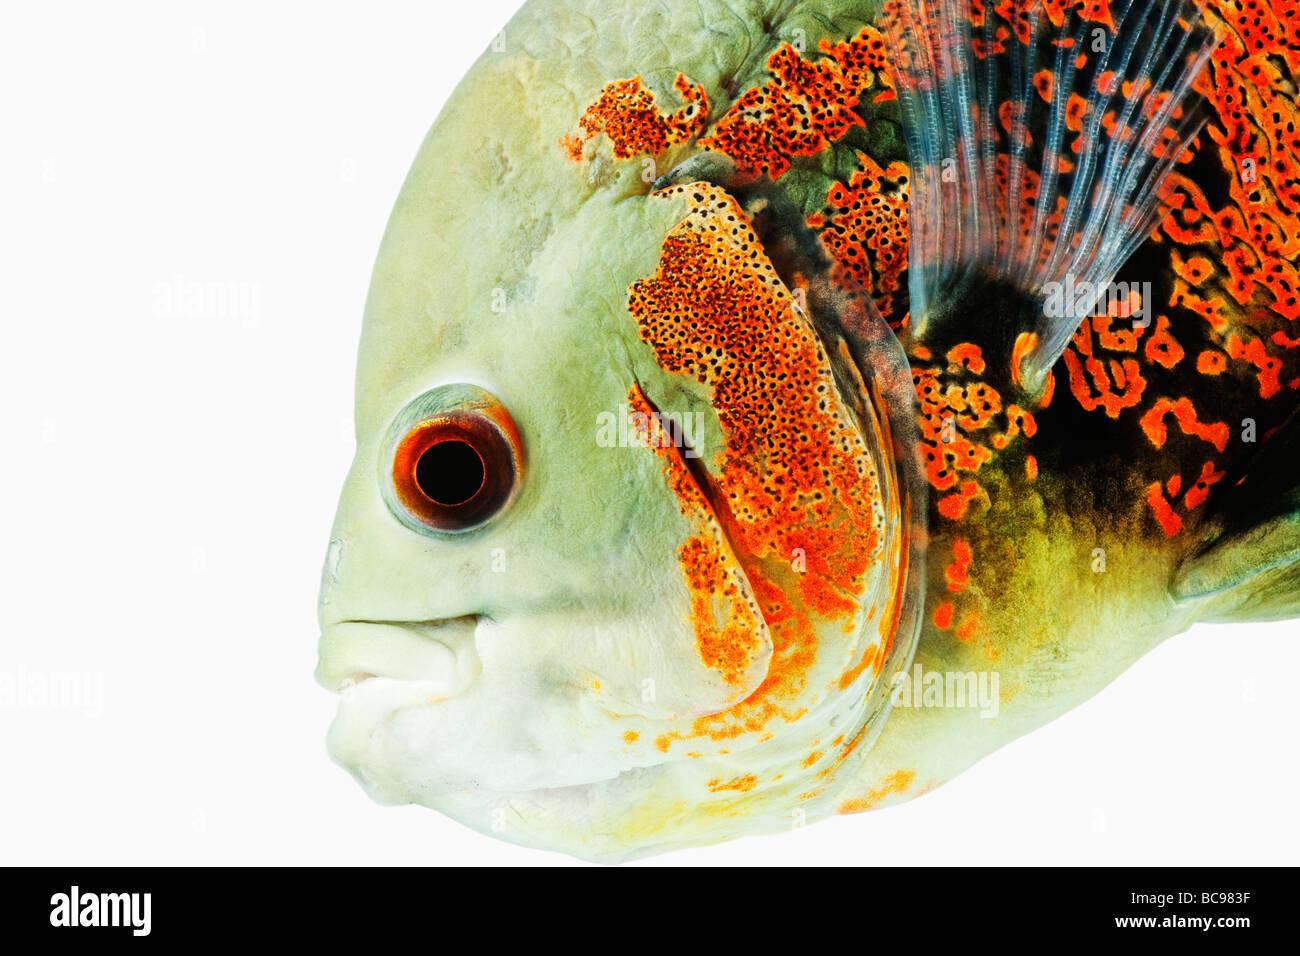 Oscar peces tropicales de agua dulce Peces Astonotus ocellatus Dist Brasil Guinea Francesa Colombia y Perú, Imagen De Stock